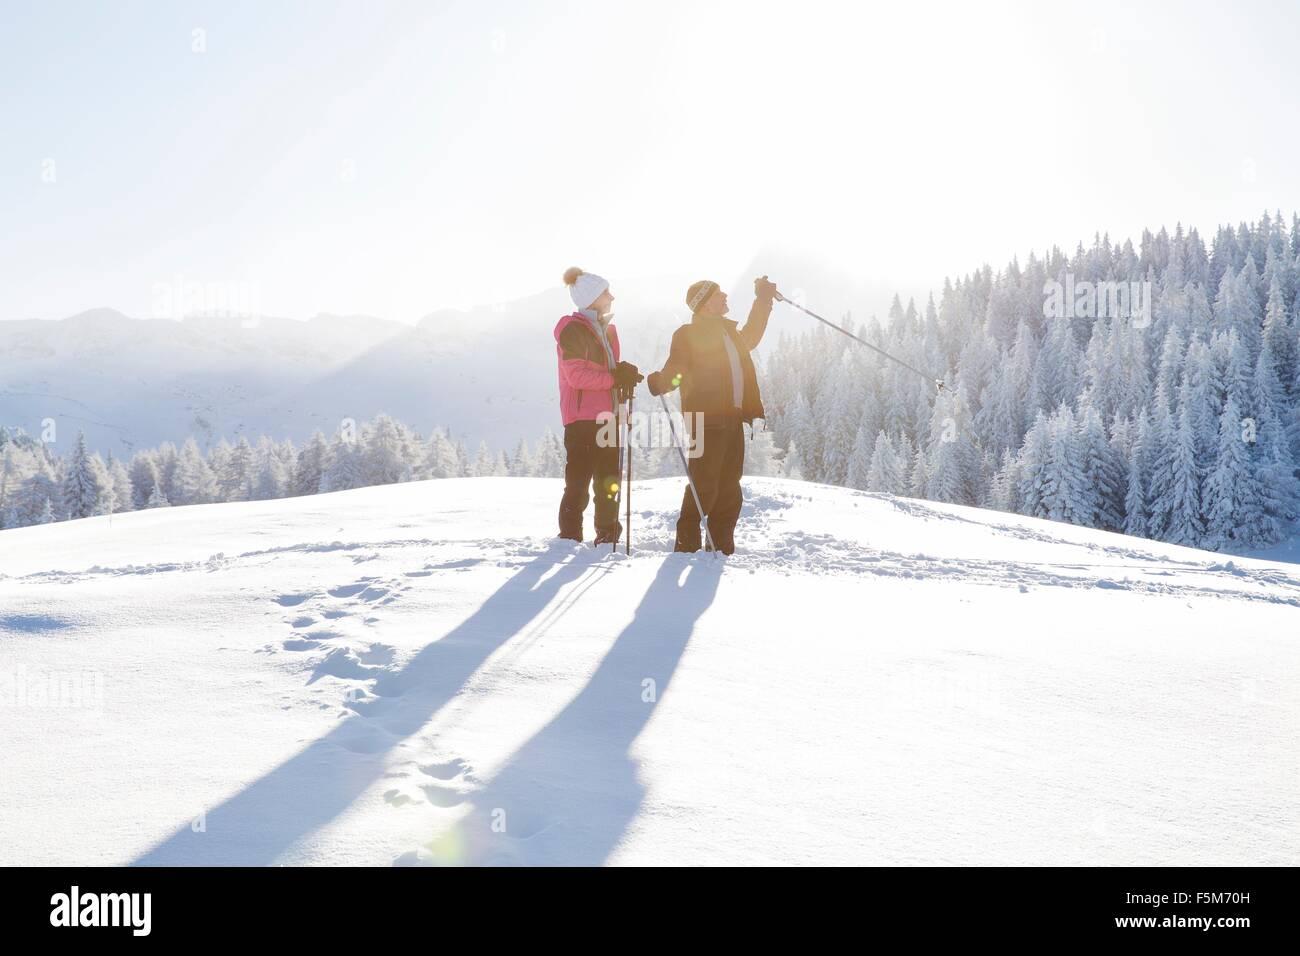 Senior couple on snow covered landscape holding walking poles looking away, Sattelbergalm, Tyrol, Austria - Stock Image